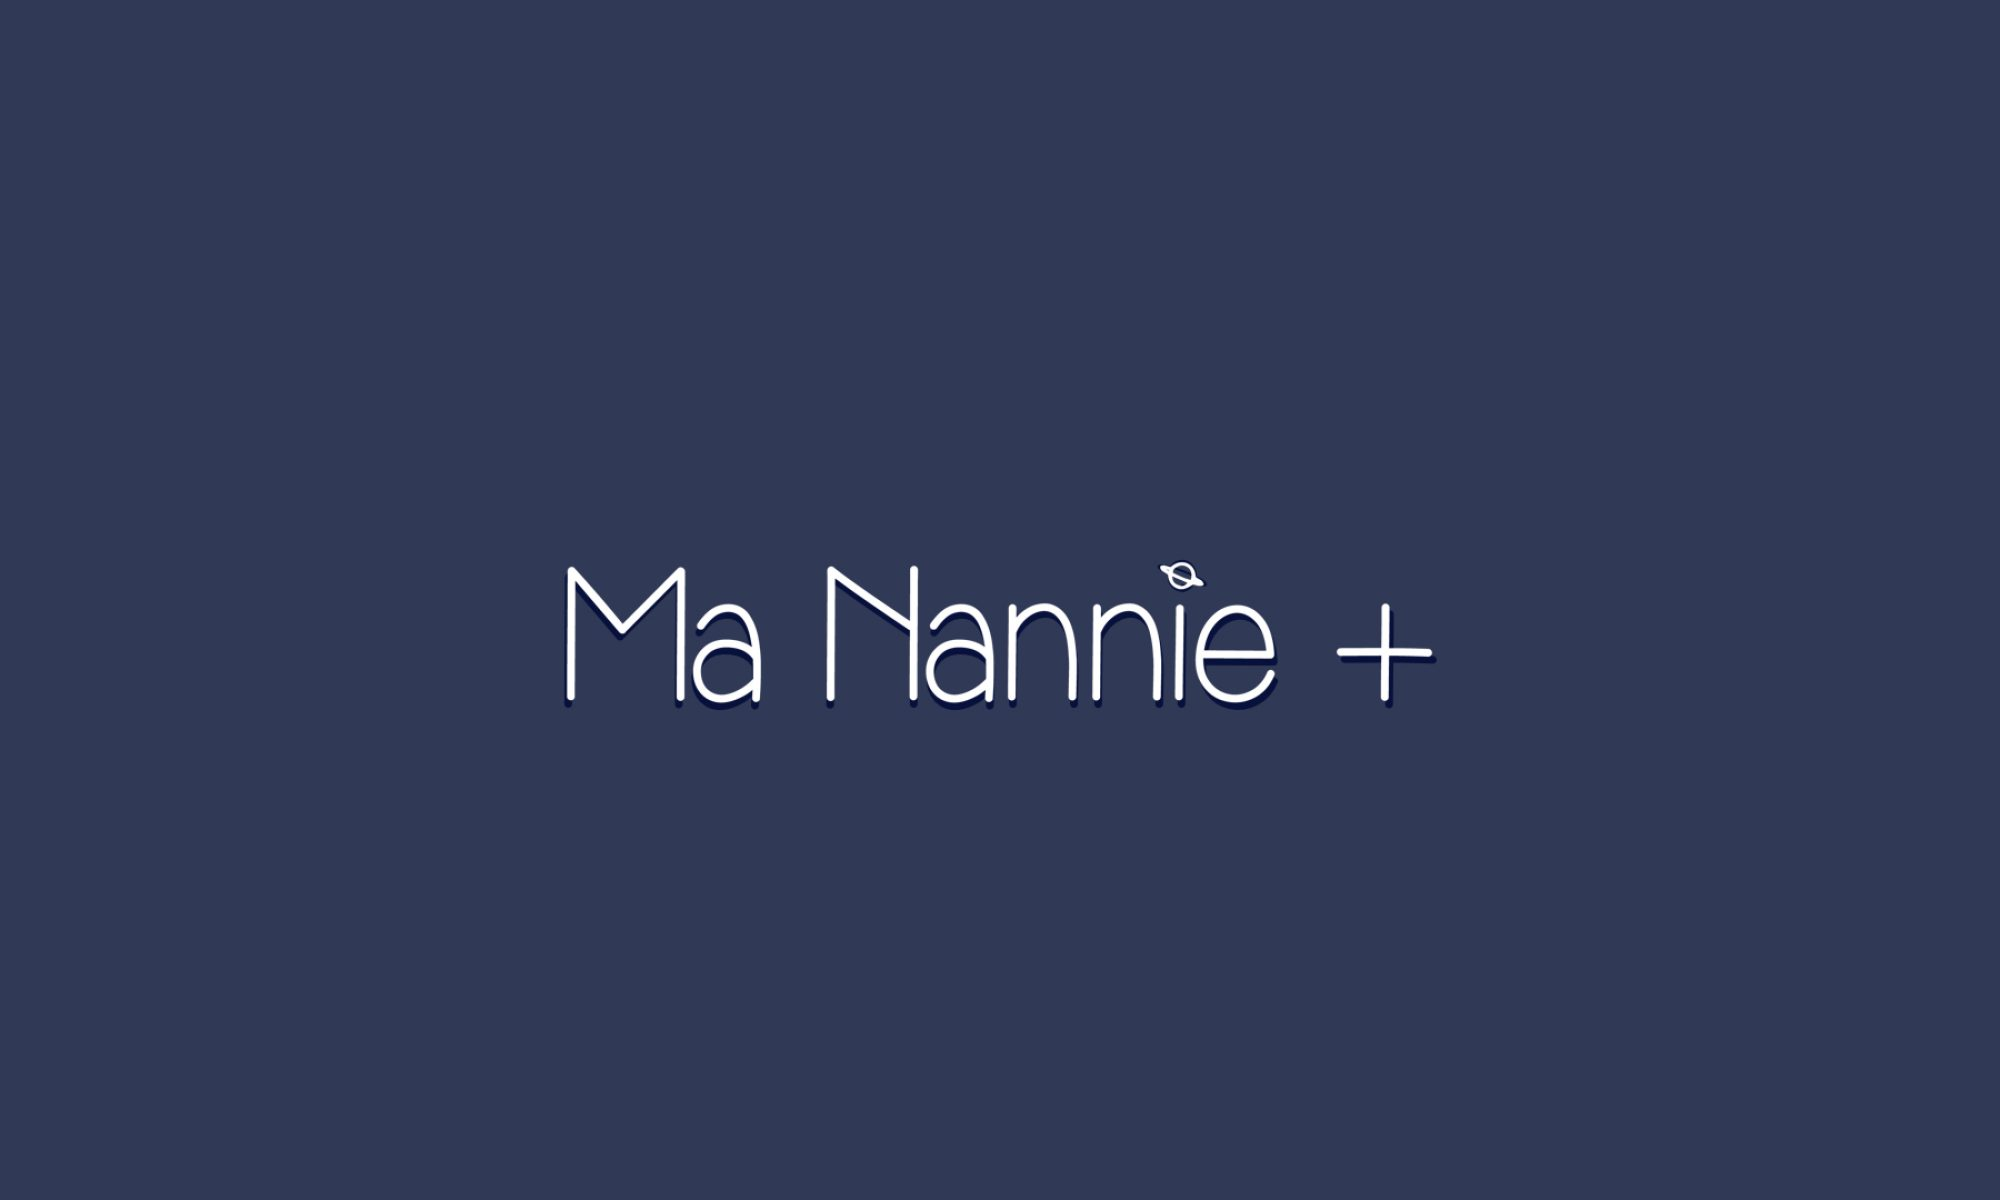 Ma Nannie +